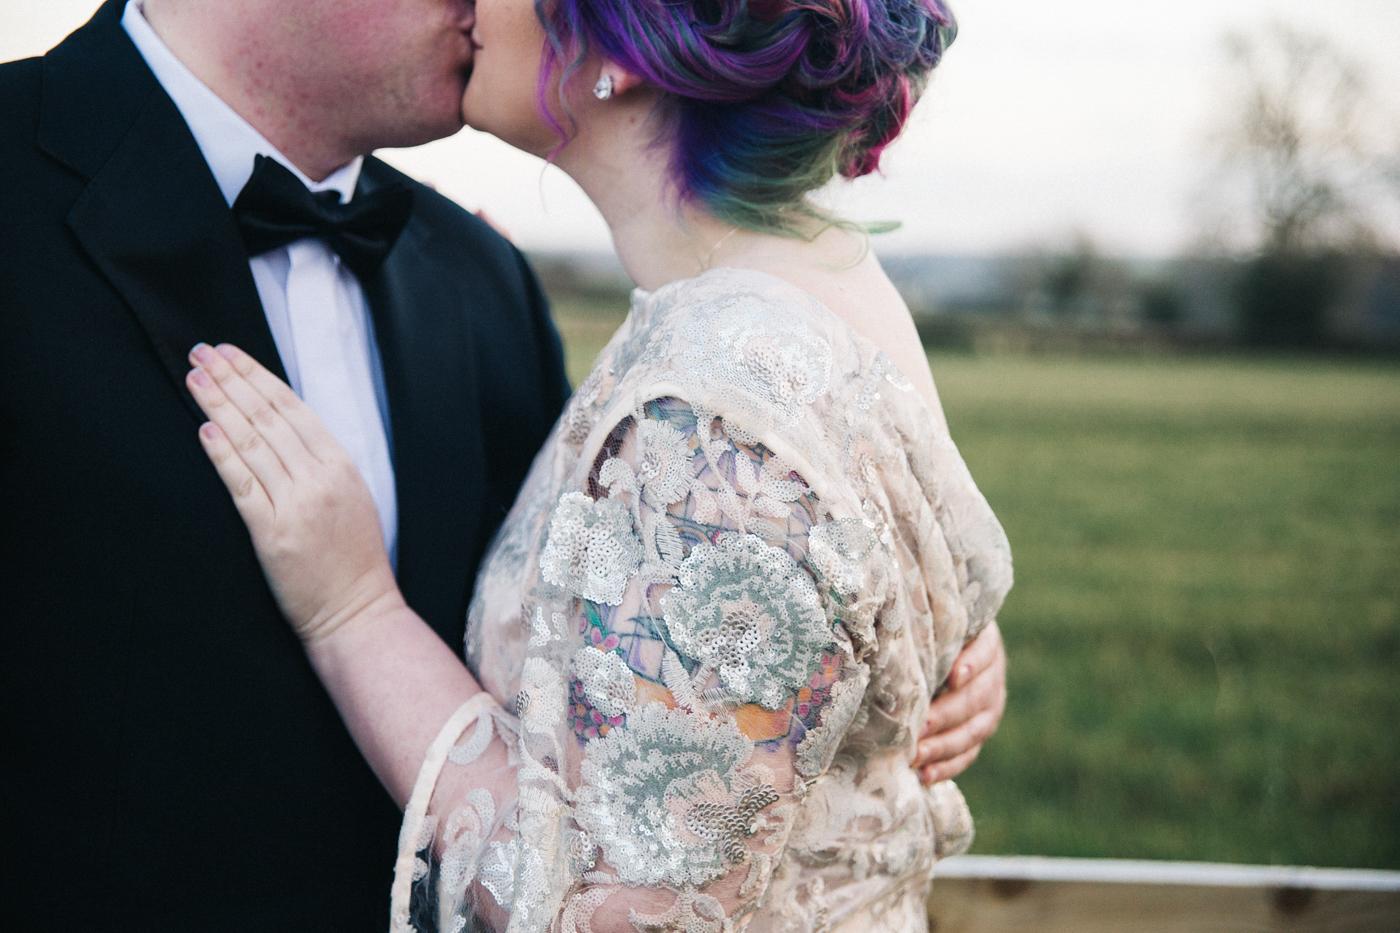 teesside-middlesbrough-north-east-wedding-photographer-creative-wedding-venues-0021.jpg